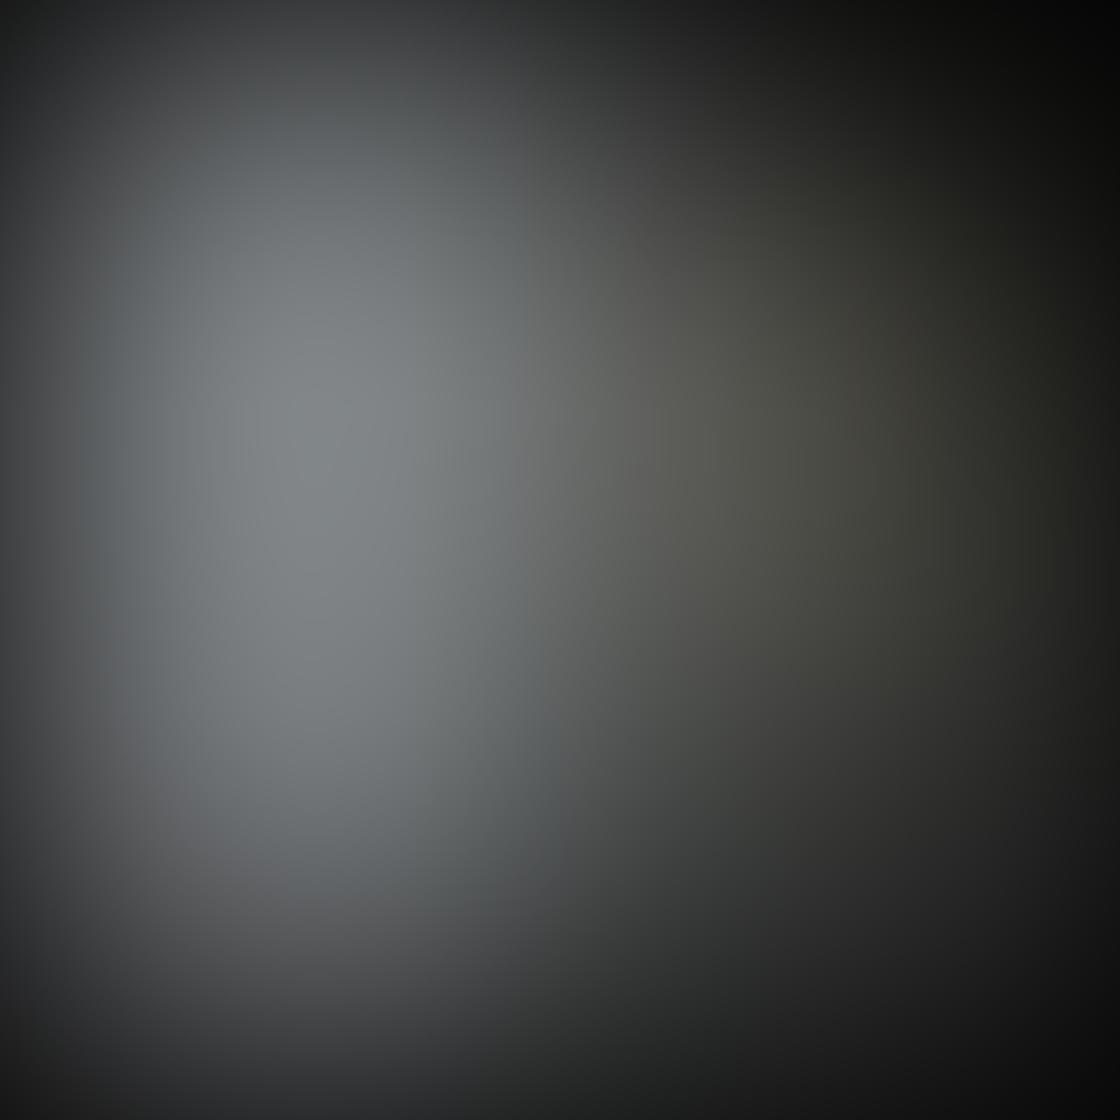 iPhone Photos Low Angle 24